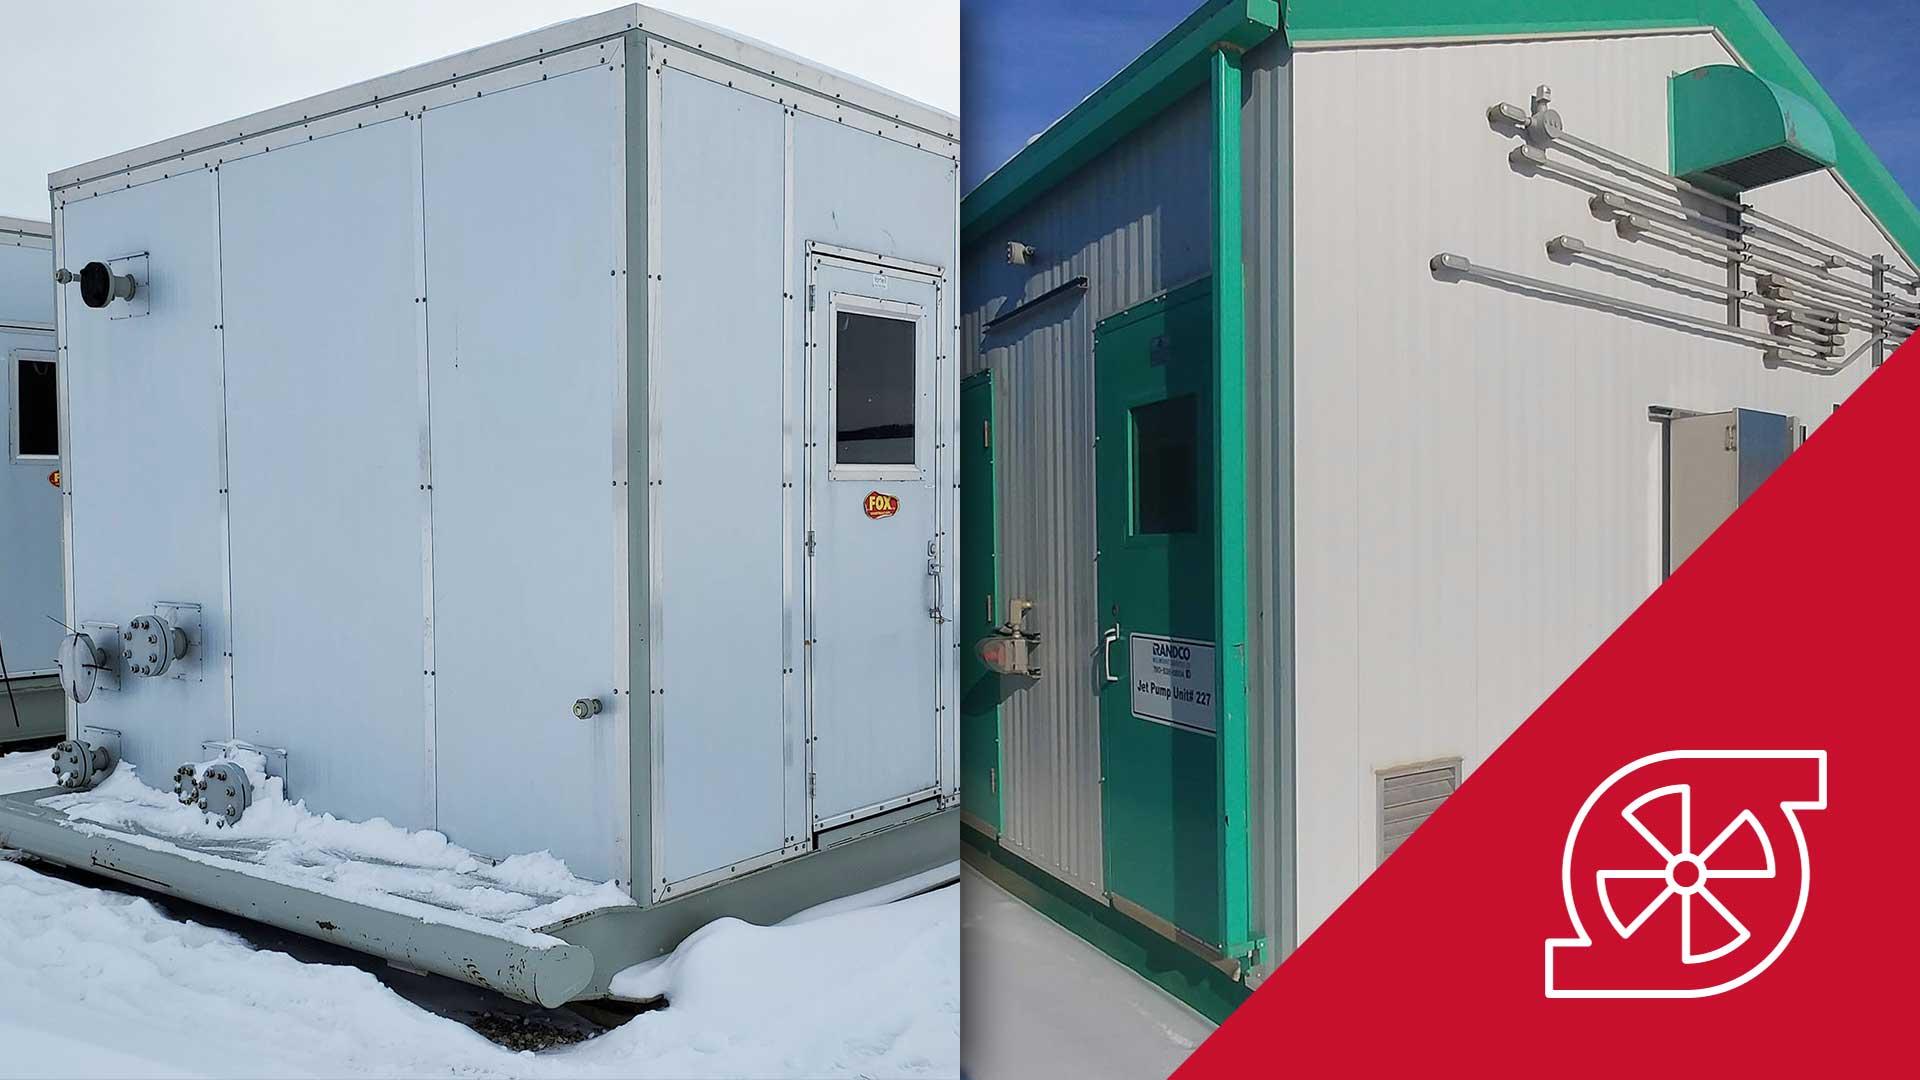 8 New & Used Jet Pump Packages For Sale in Grande Prairie, Alberta, Canada oil and gas oilfield energy equipment surplus